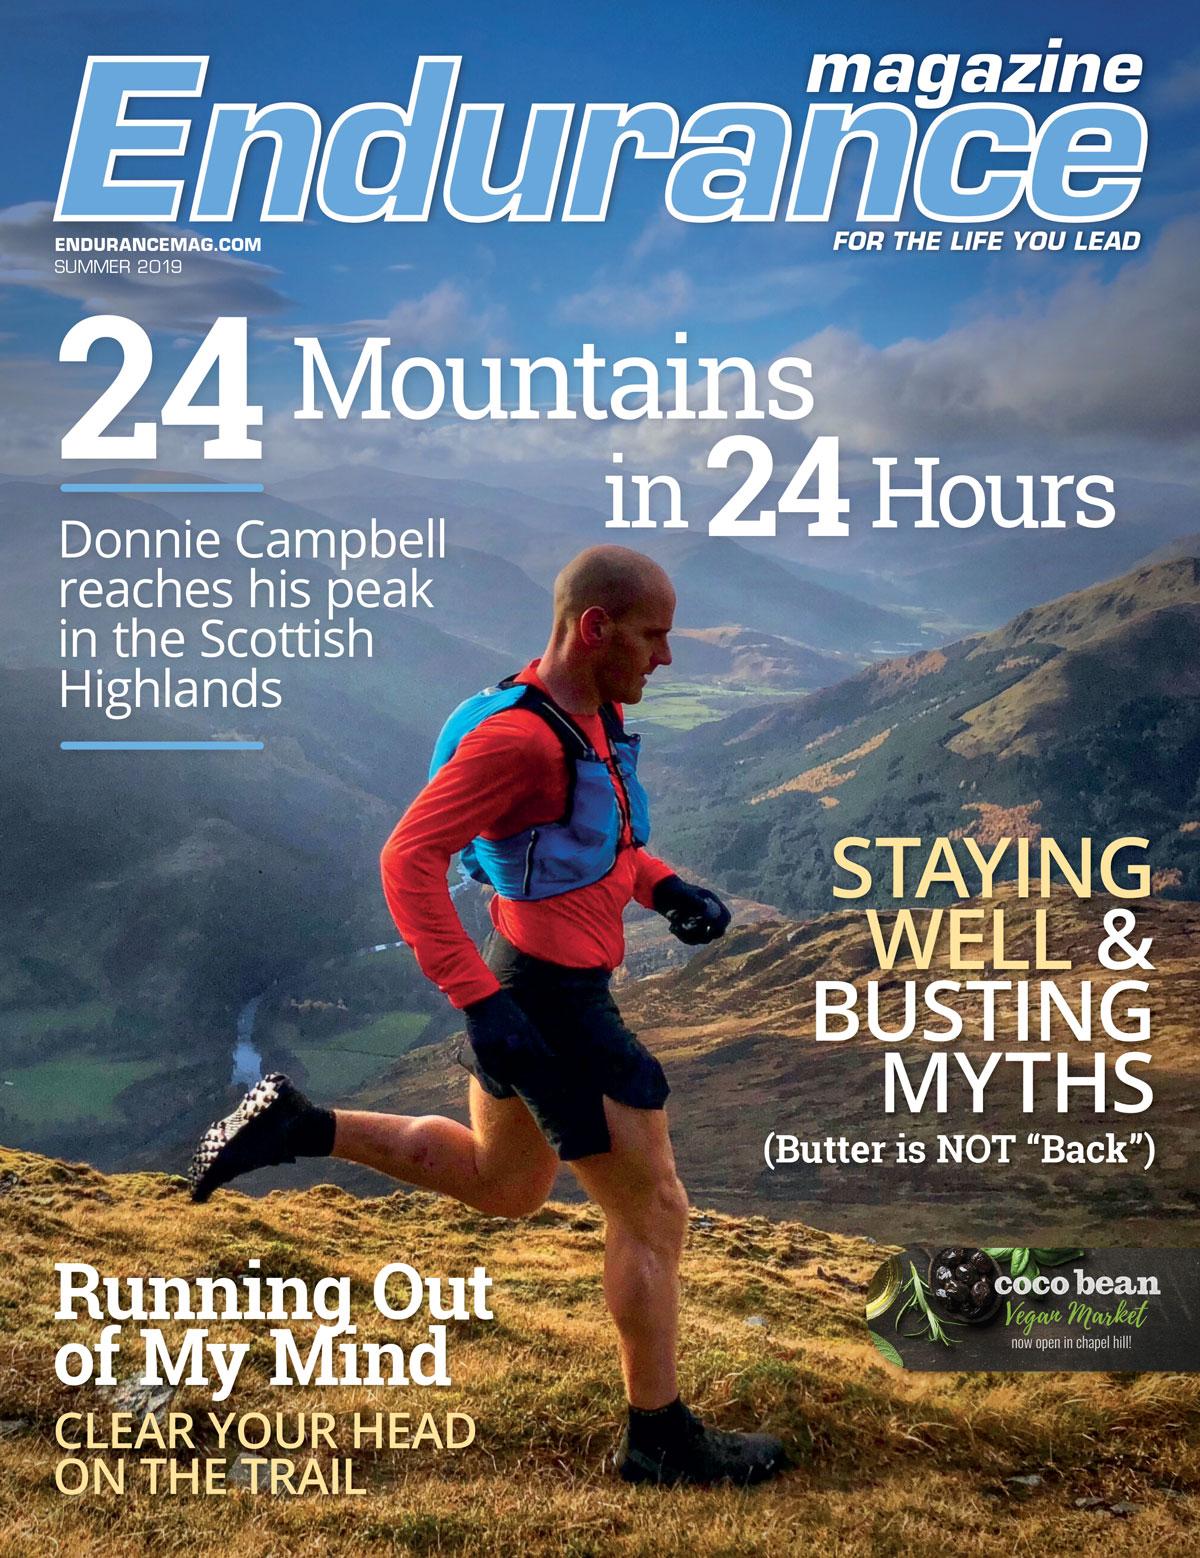 Endurance Magazine Summer 2019 Cover